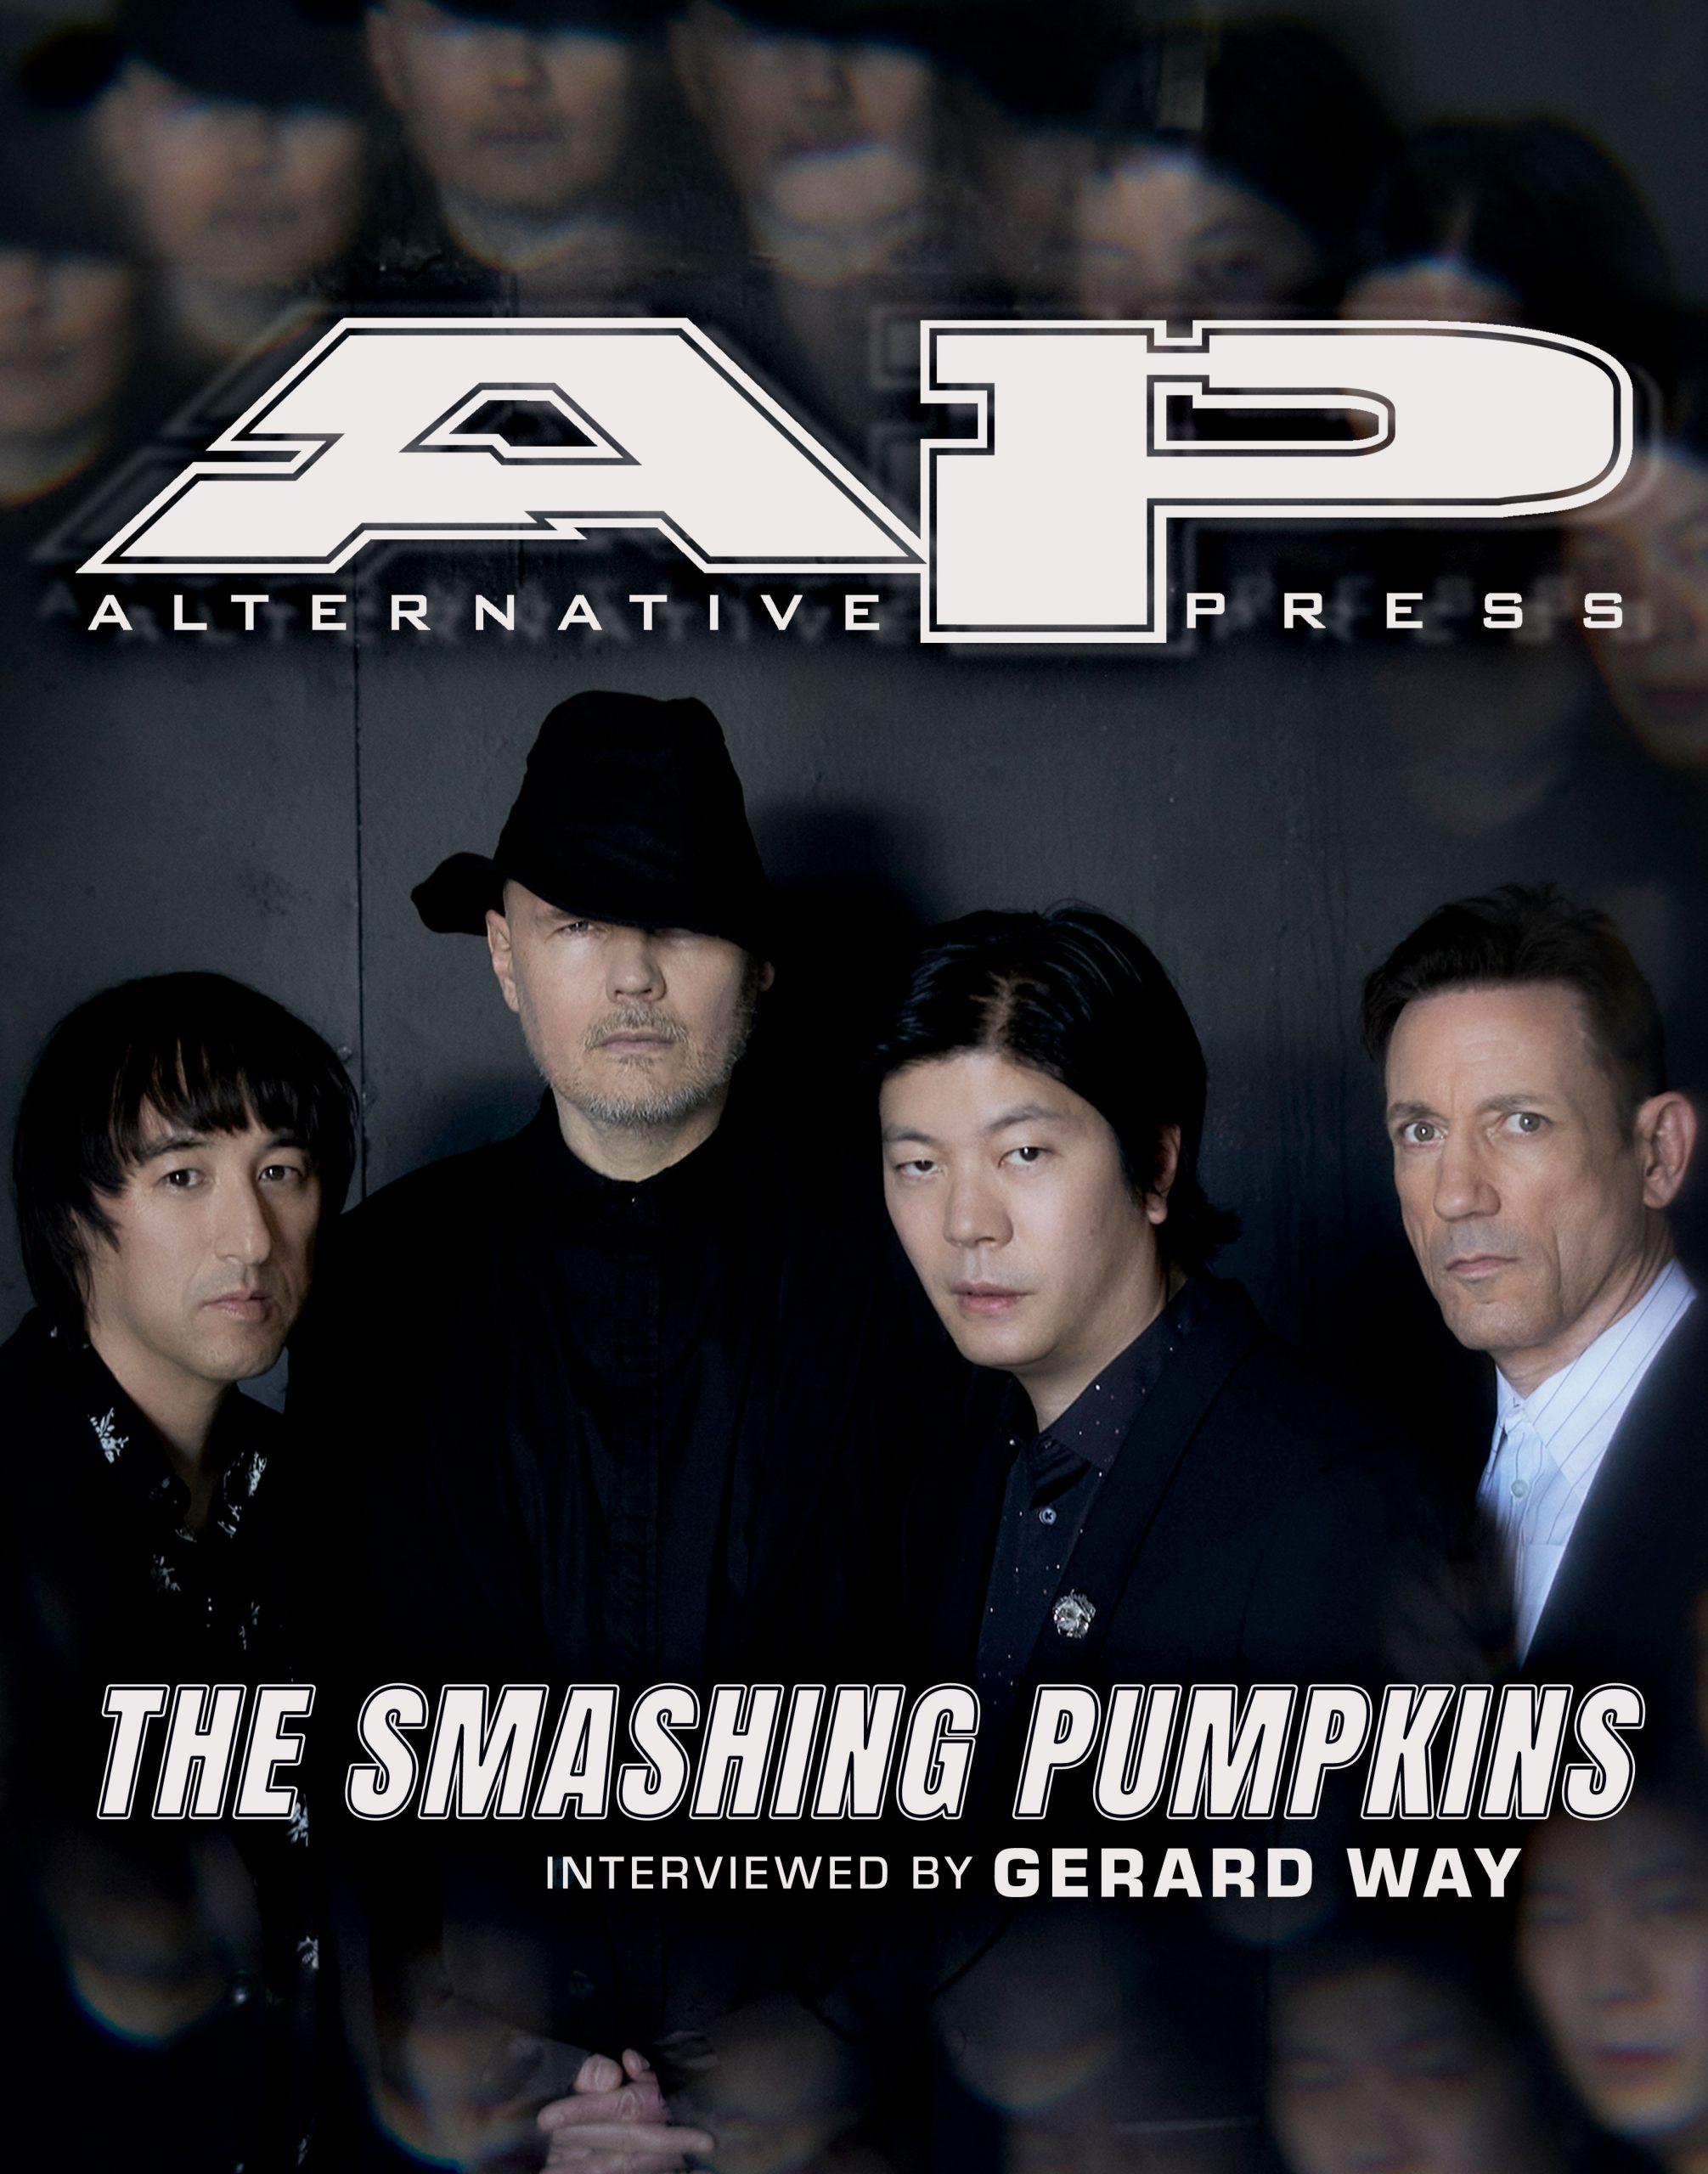 The Smashing Pumpkins Gerard Way interview Billy Corgan CYR magazine cover